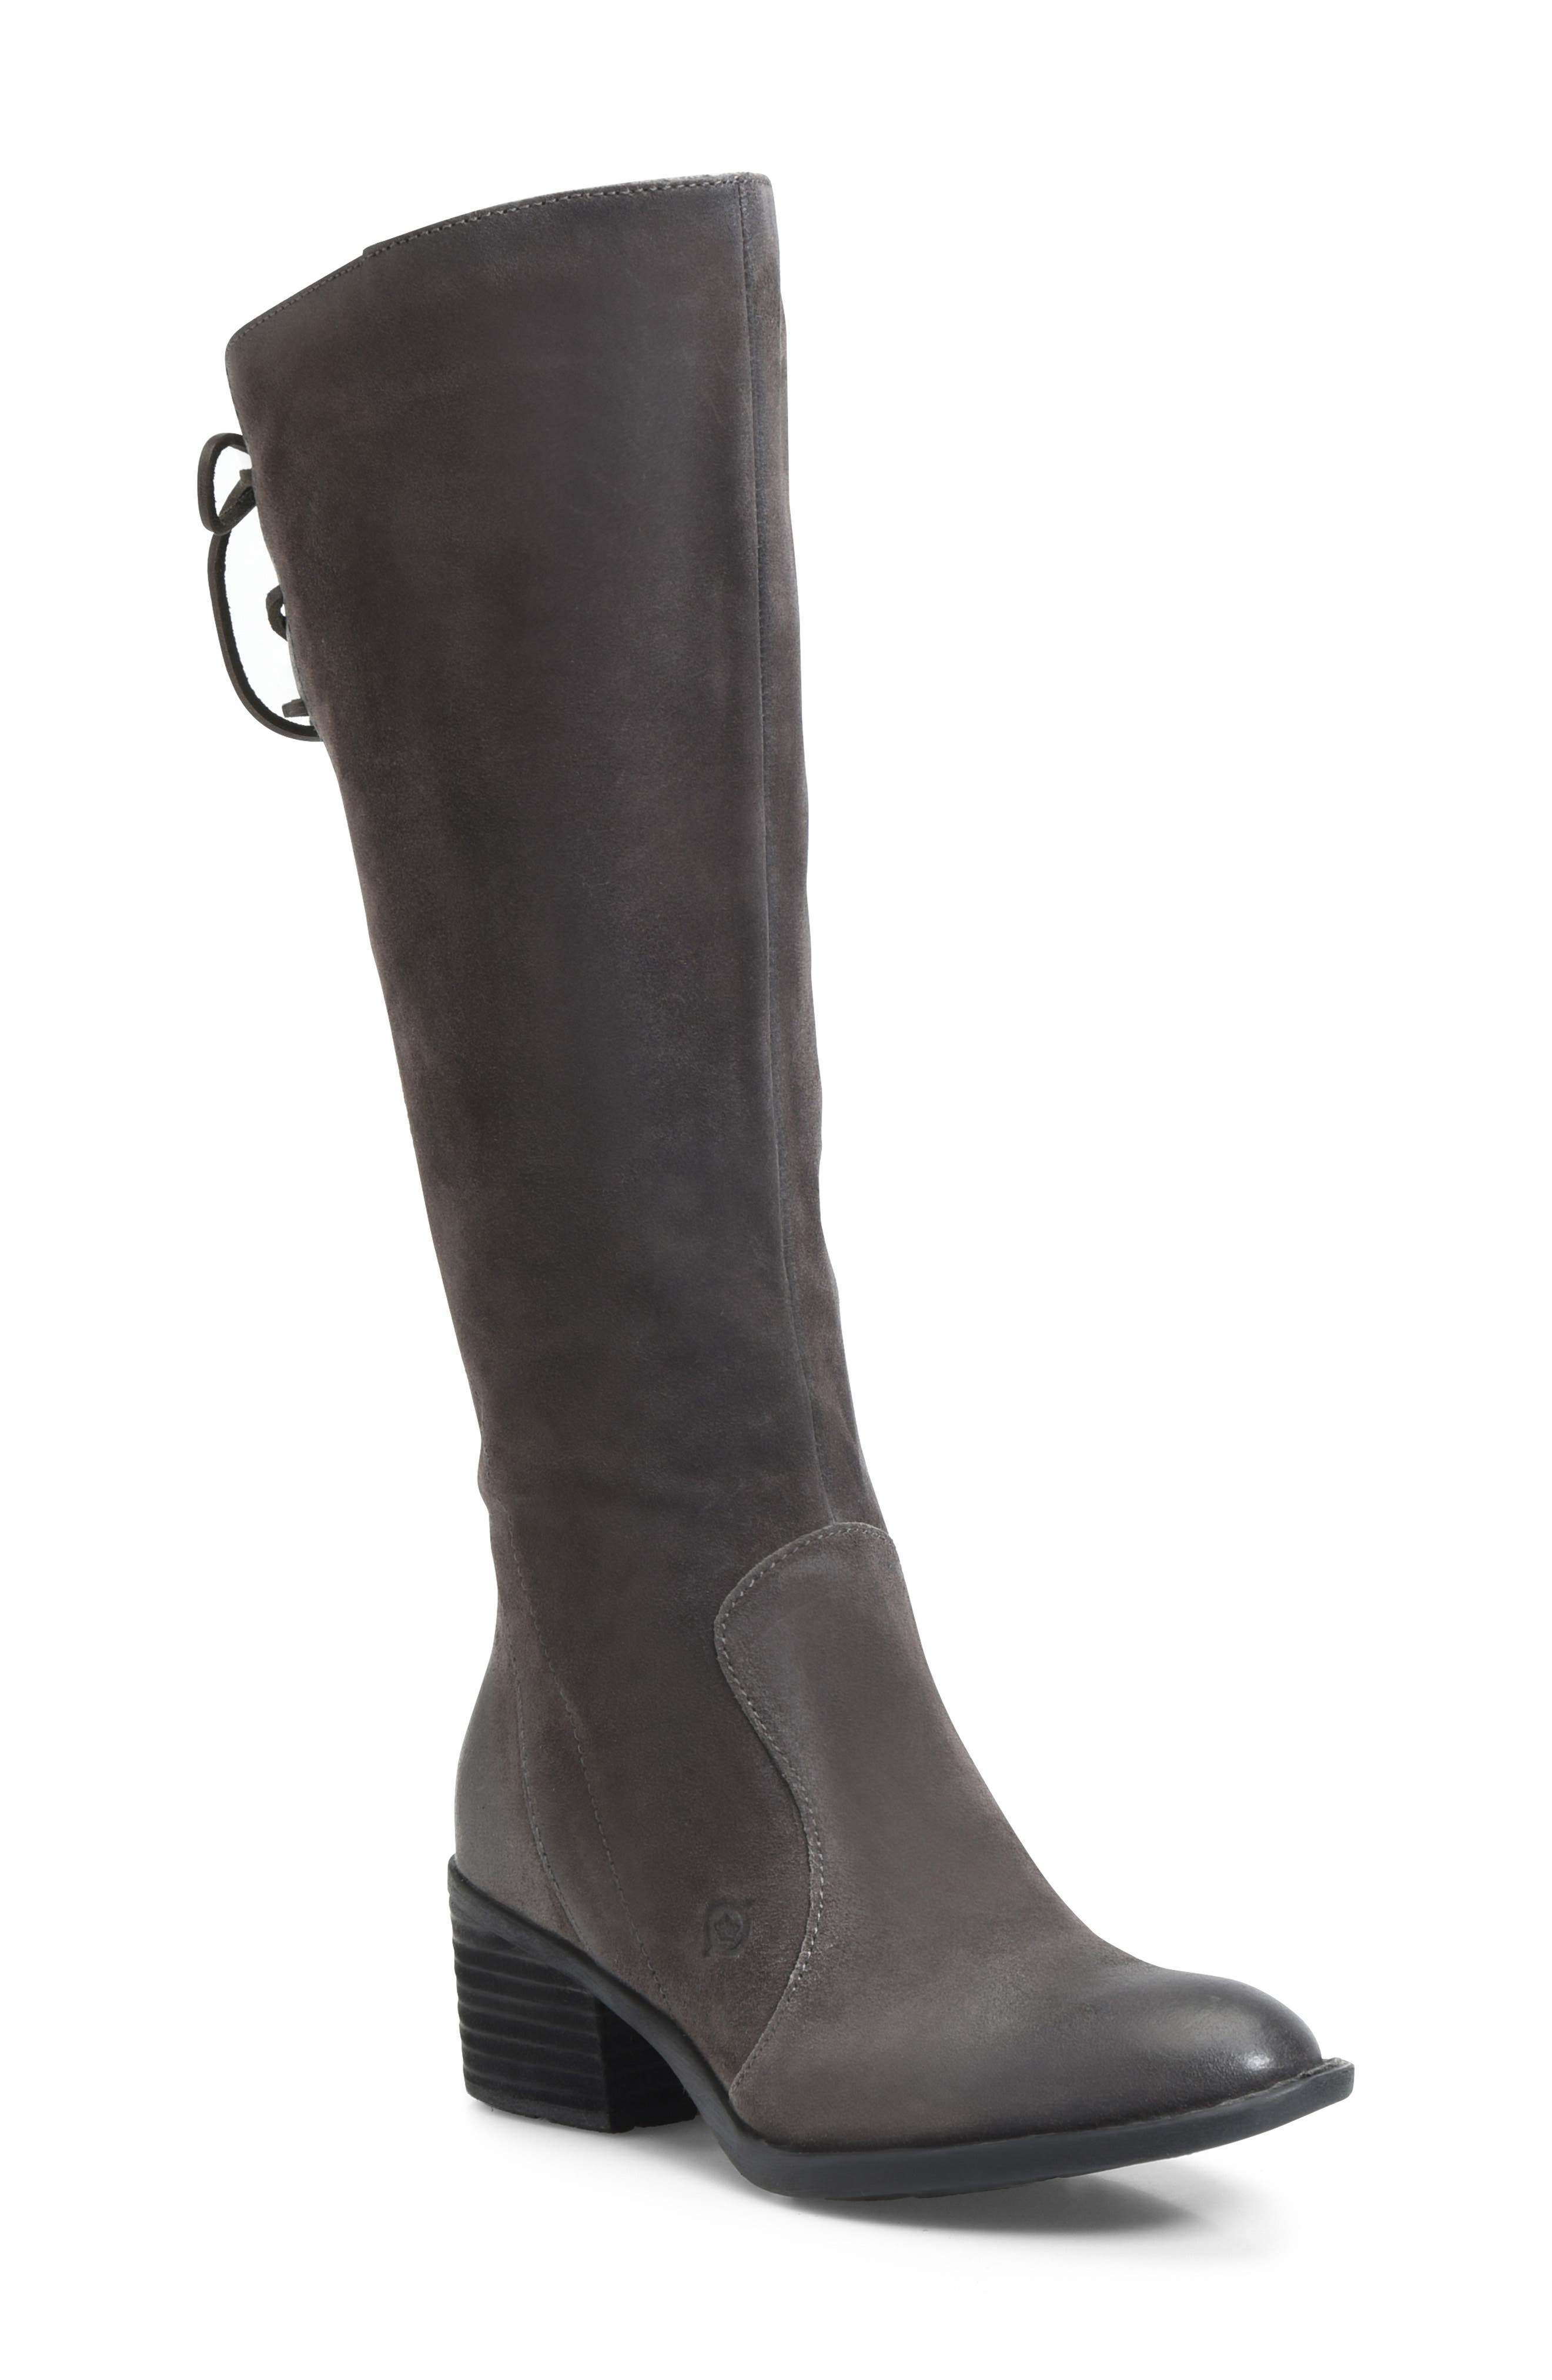 B?rn Felicia Knee High Boot, Regular Calf- Grey